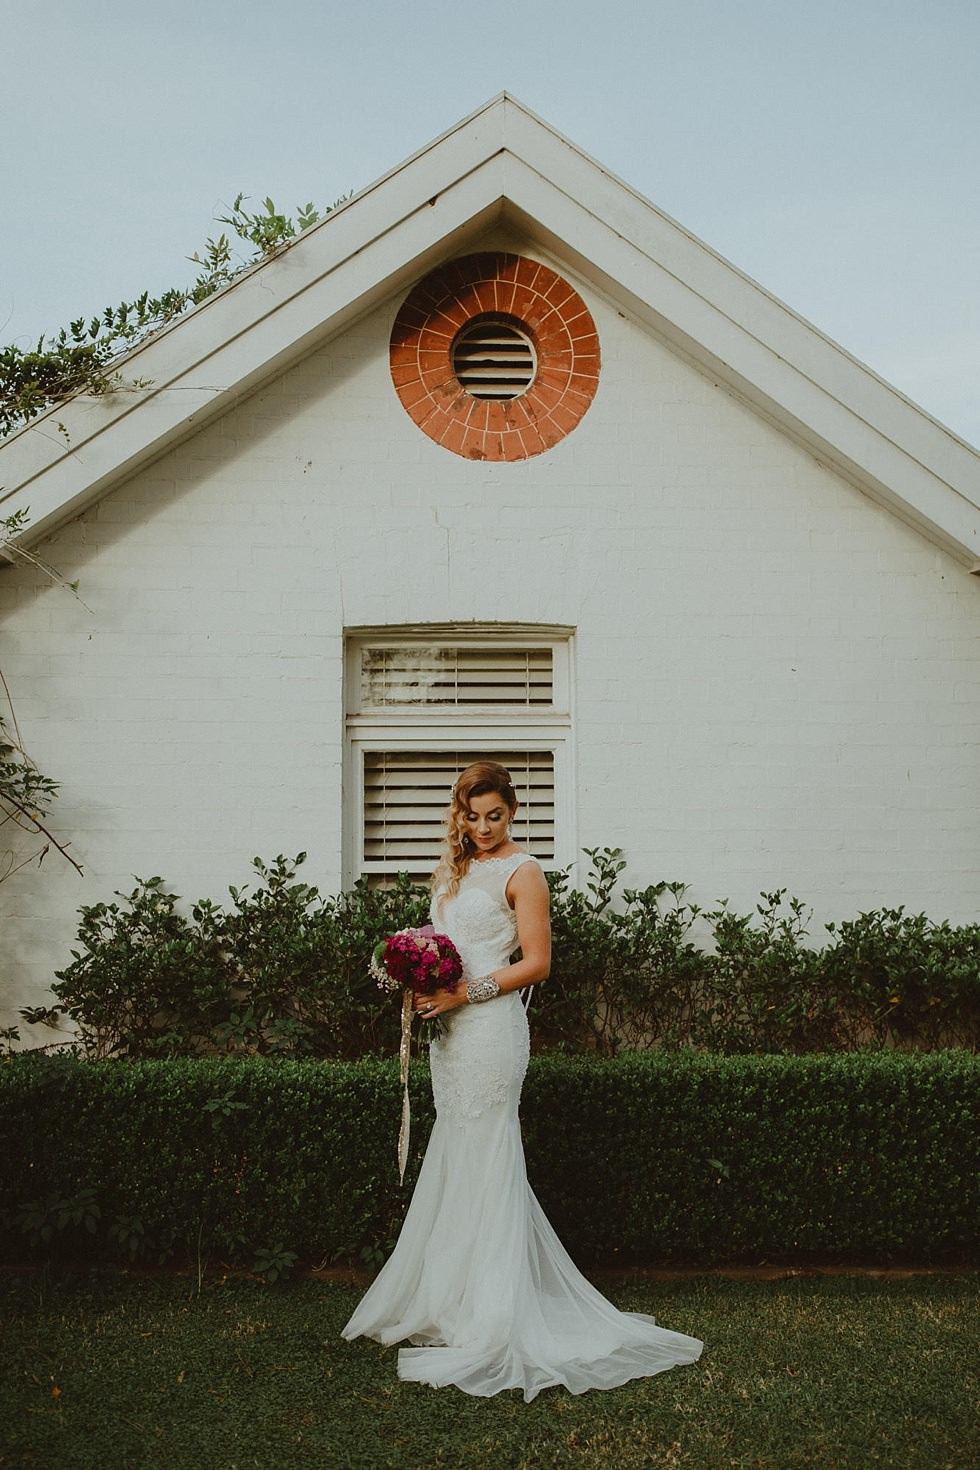 revensthorpe wedding_tayte+matt (71 of 167)